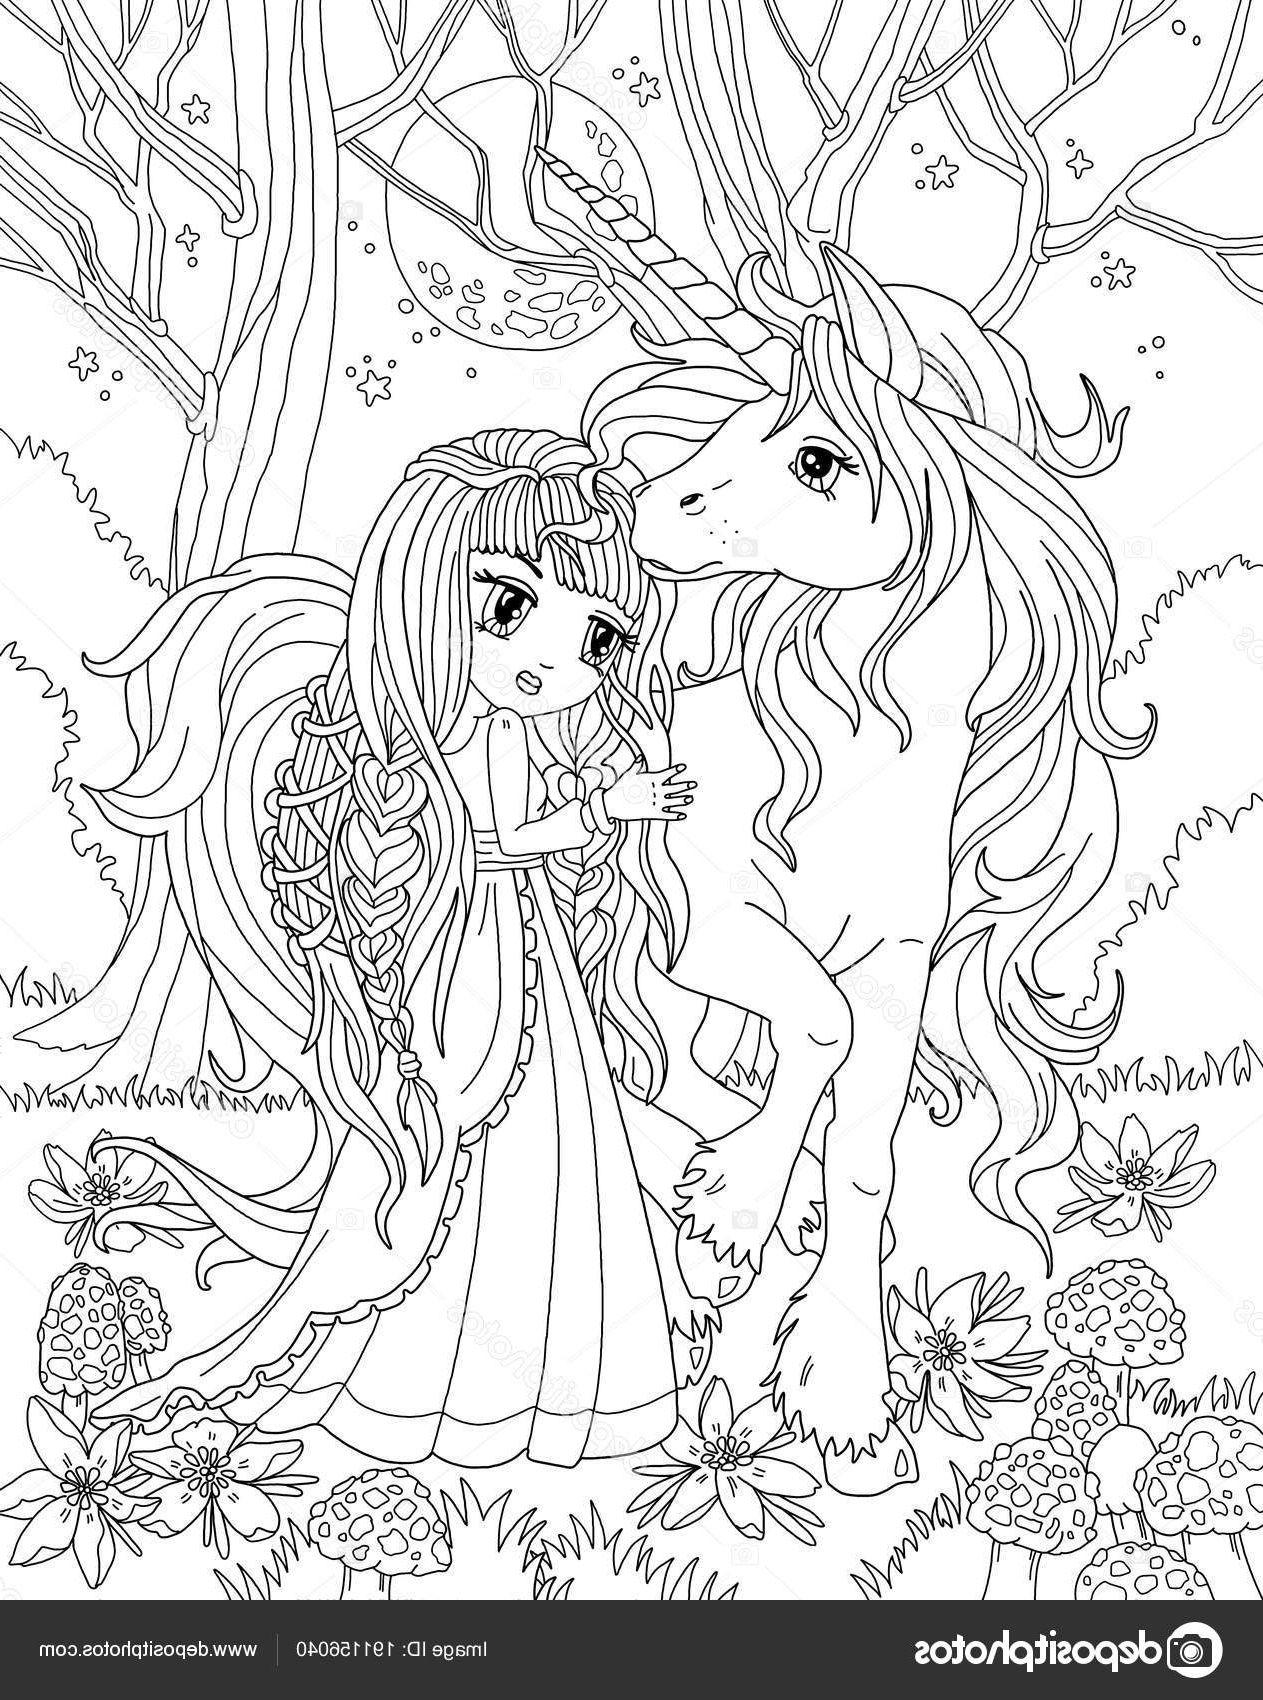 5 Inspirant De Coloriage Princesse Licorne Photos  Unicorn